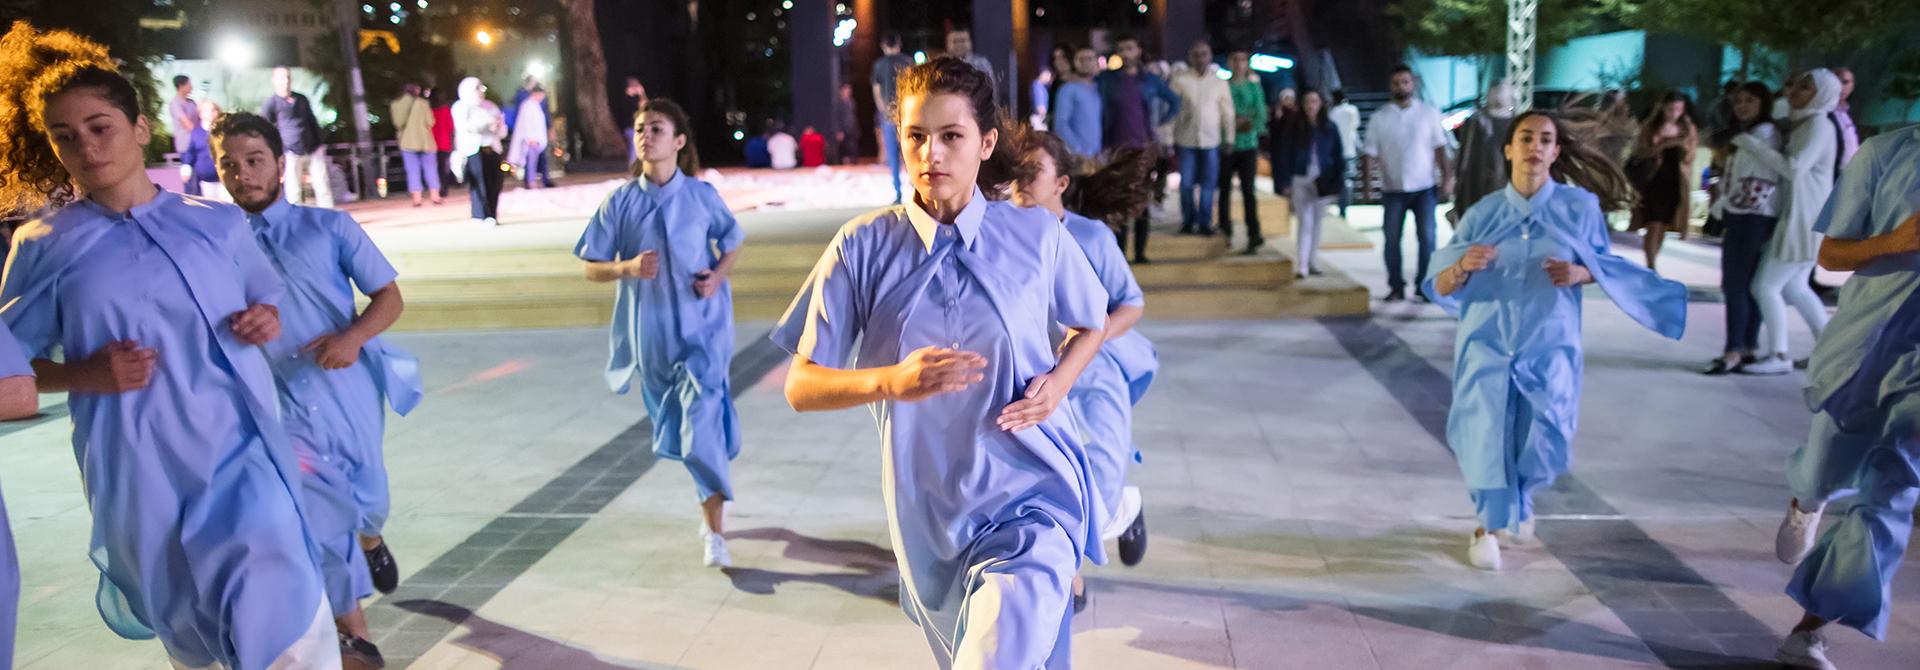 2017 Loop Performance by Shireen Talhouni